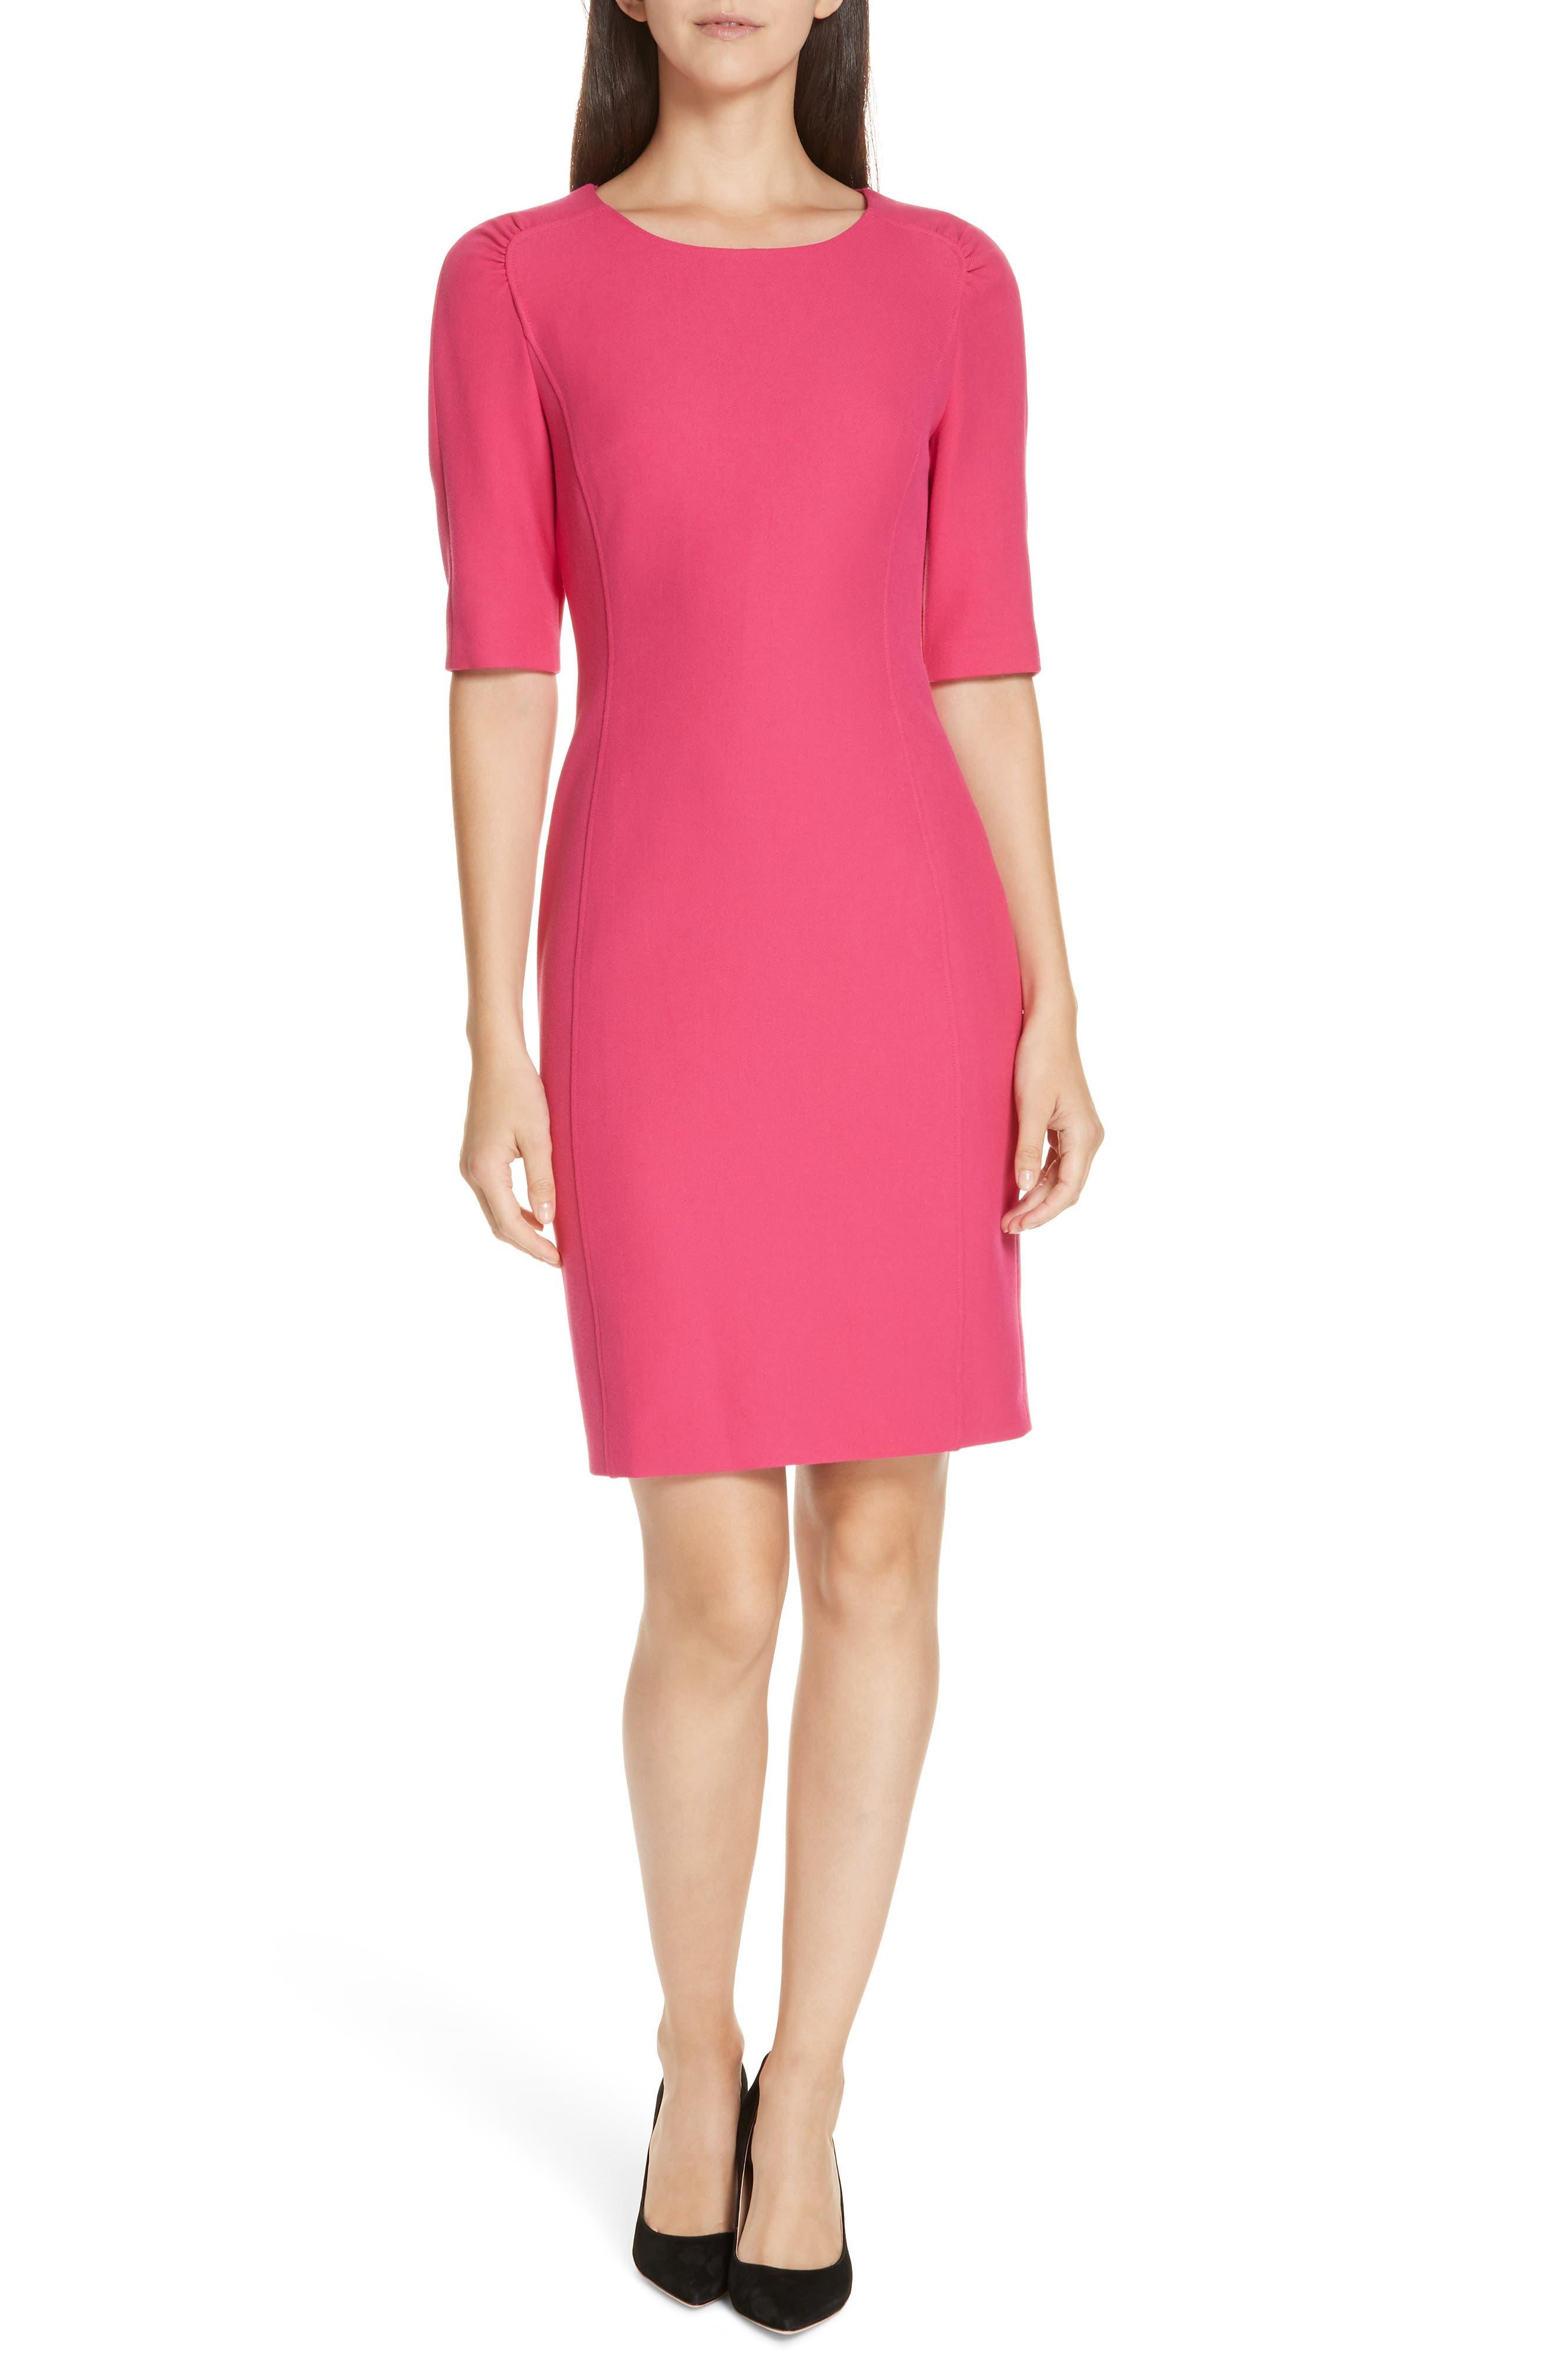 Daletana Soft Twill Dress by Boss